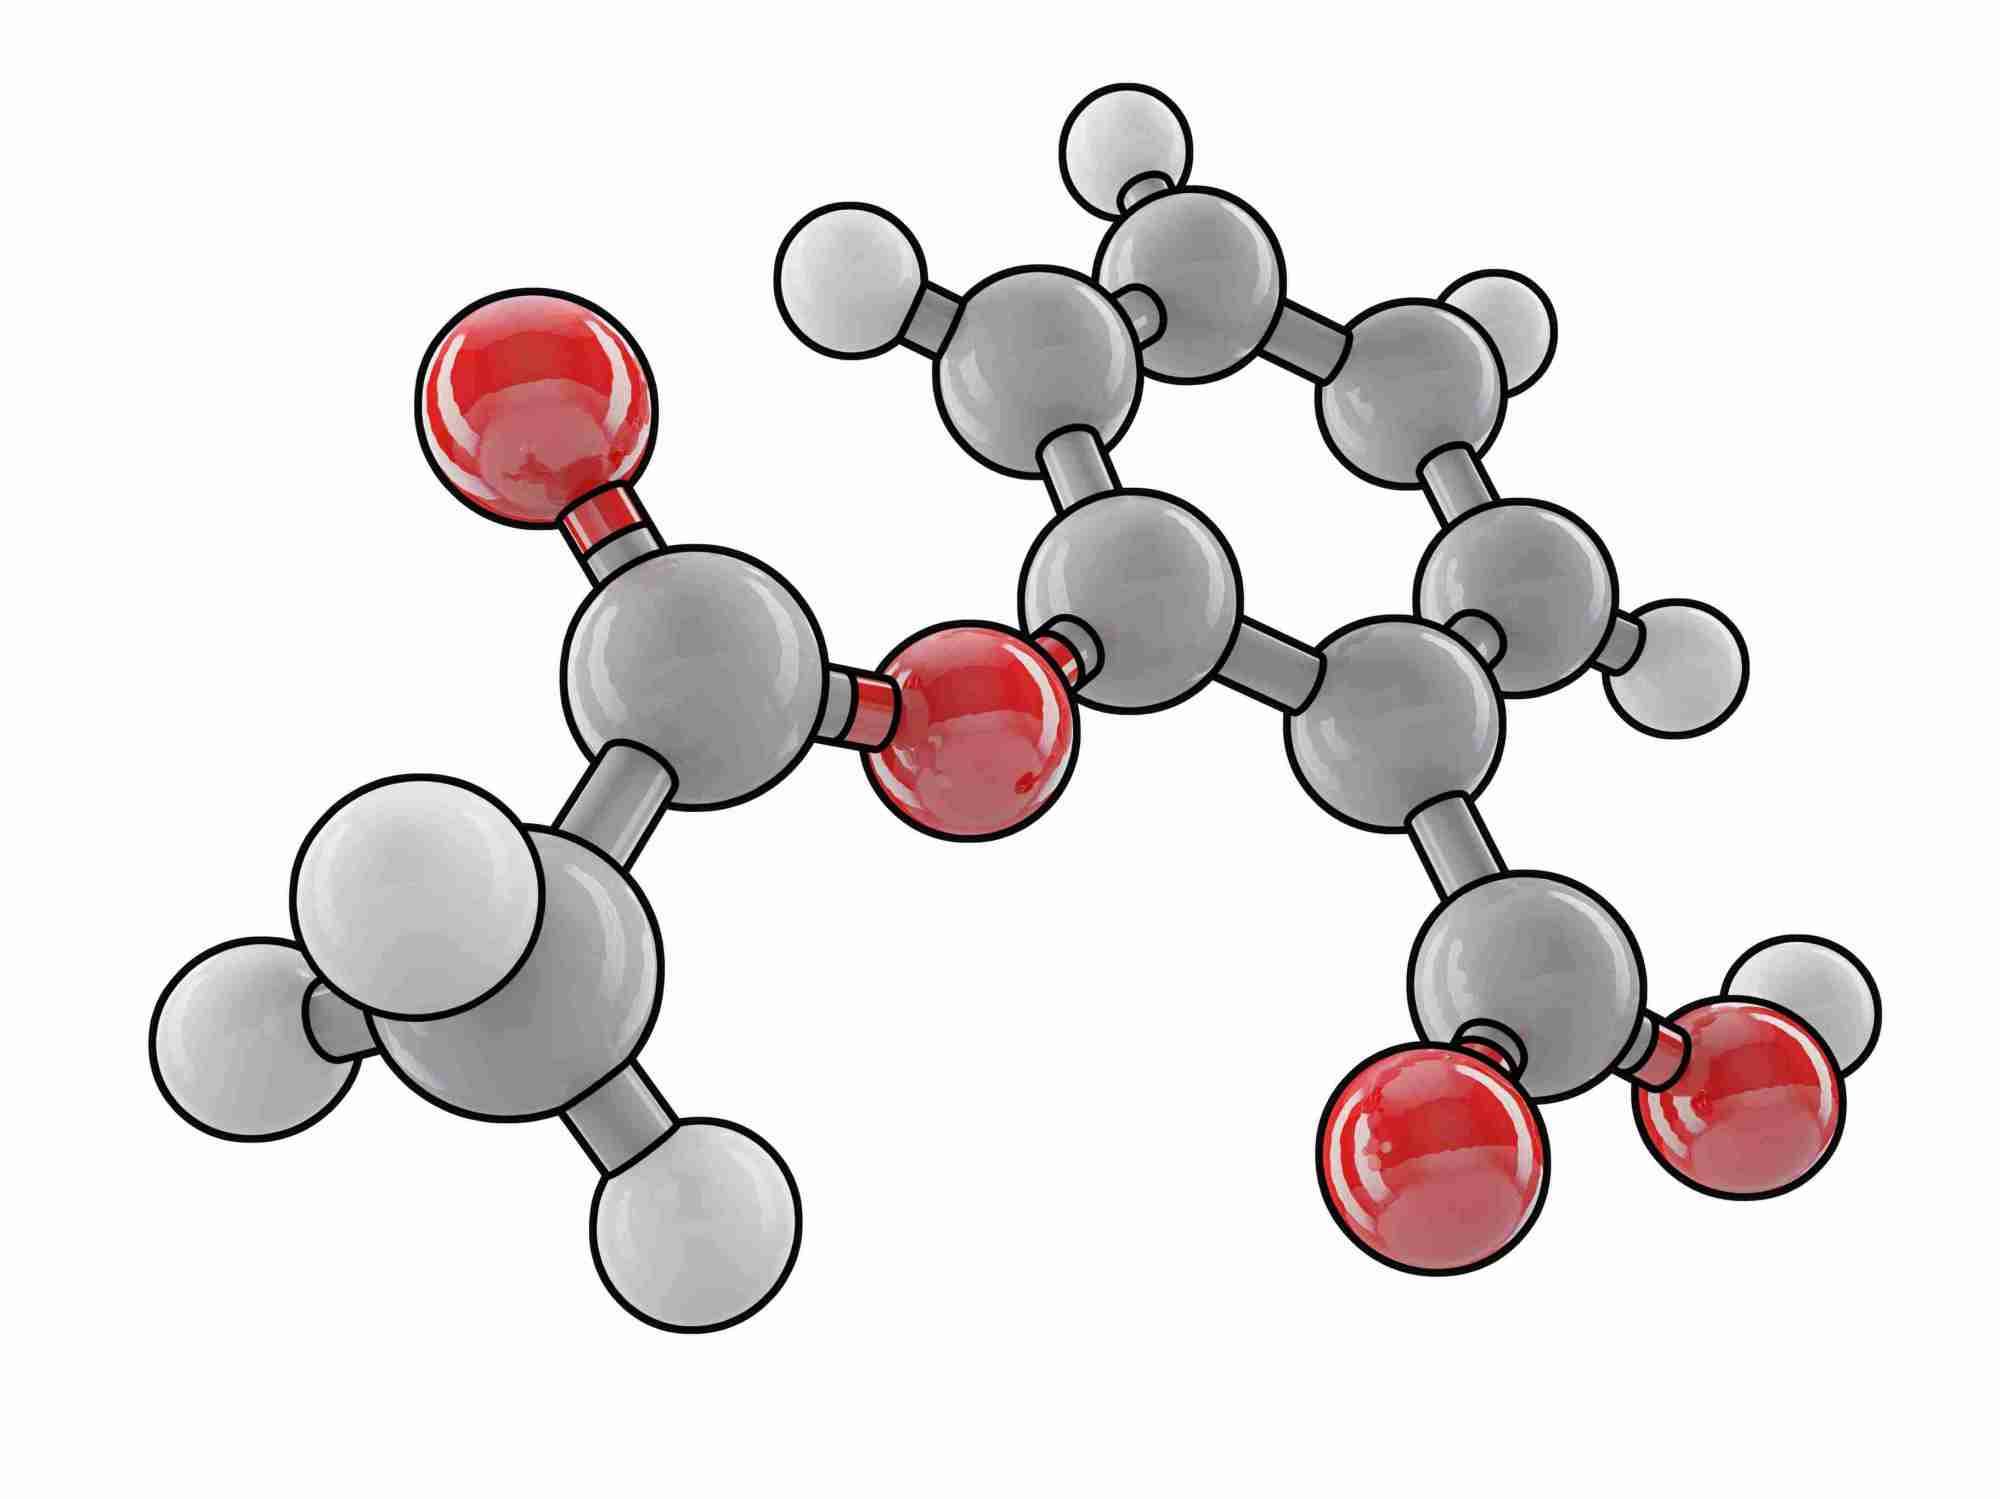 hight resolution of aspirin molecule